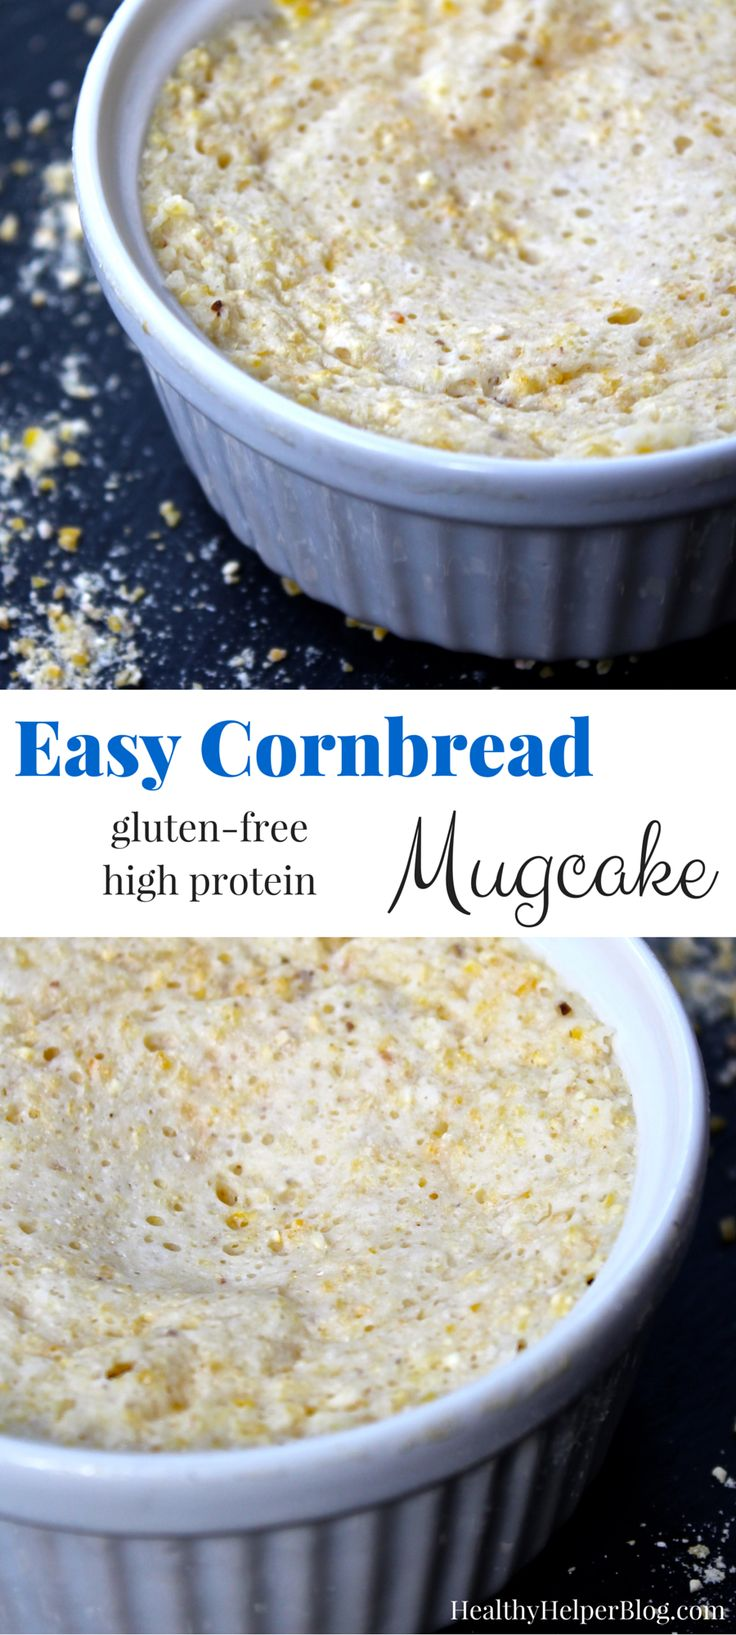 Easy Cornbread Mugcake   Recipe   Protein snacks ...